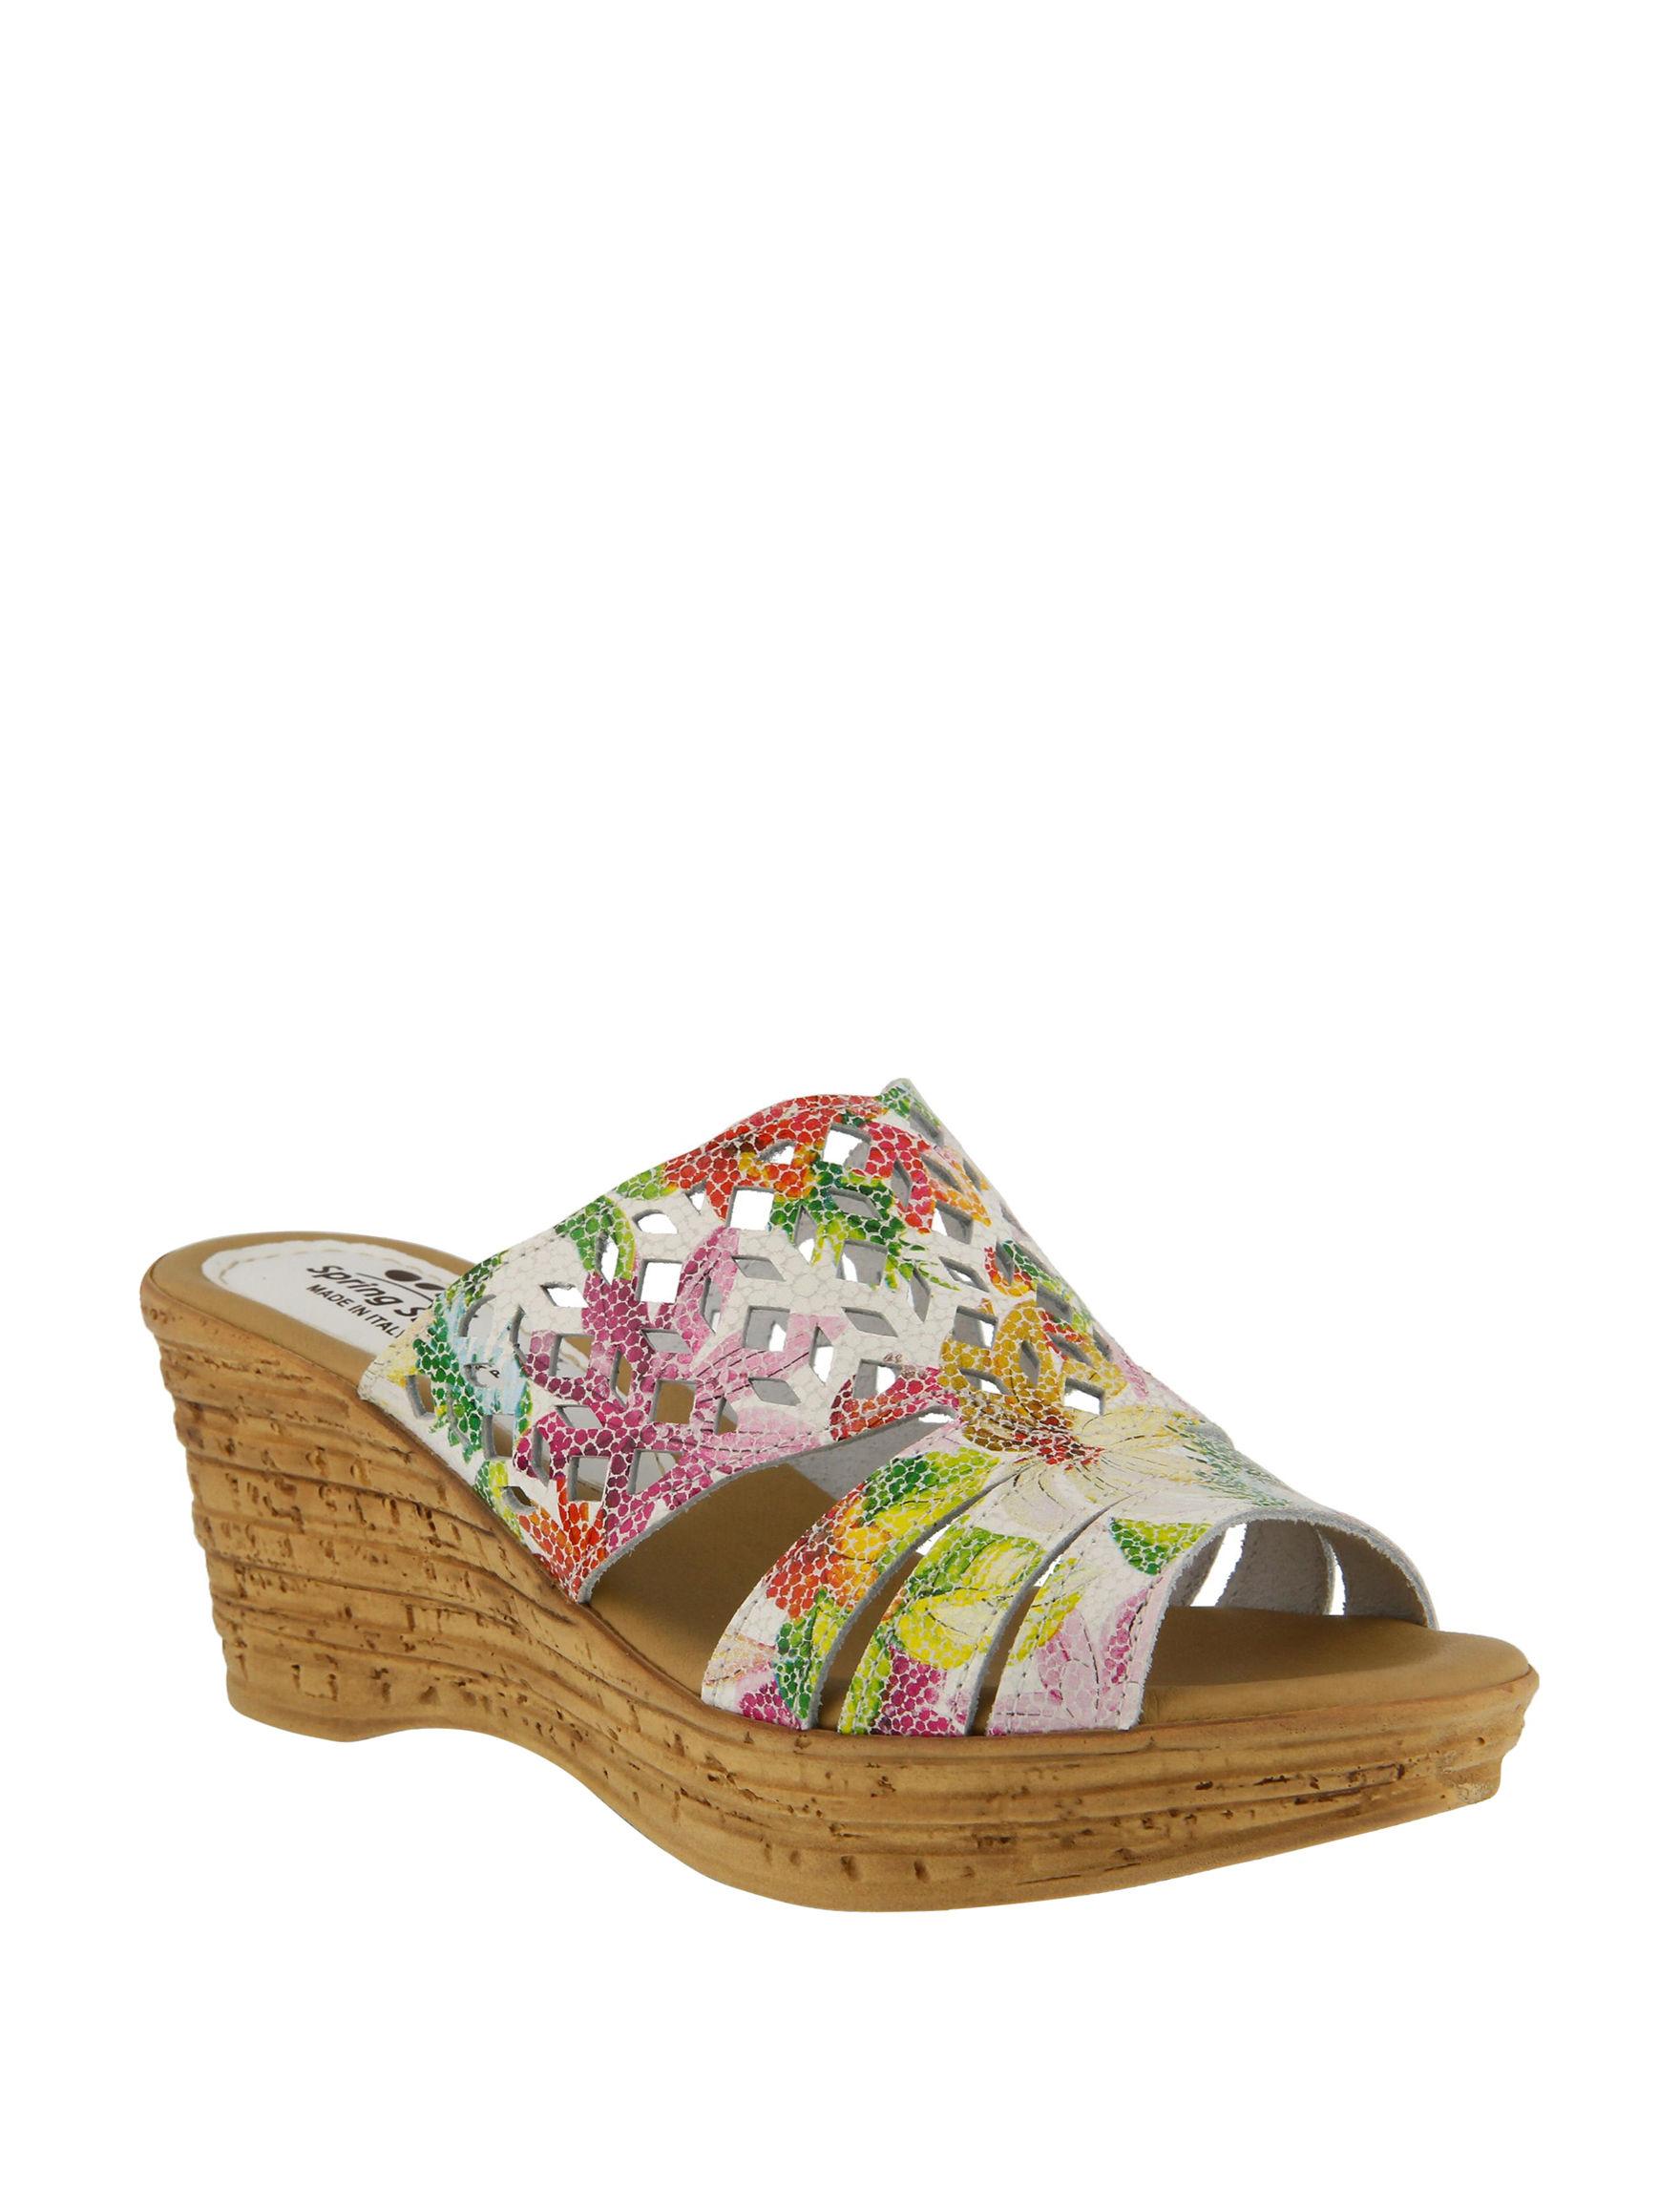 Spring Step White Multi Wedge Sandals